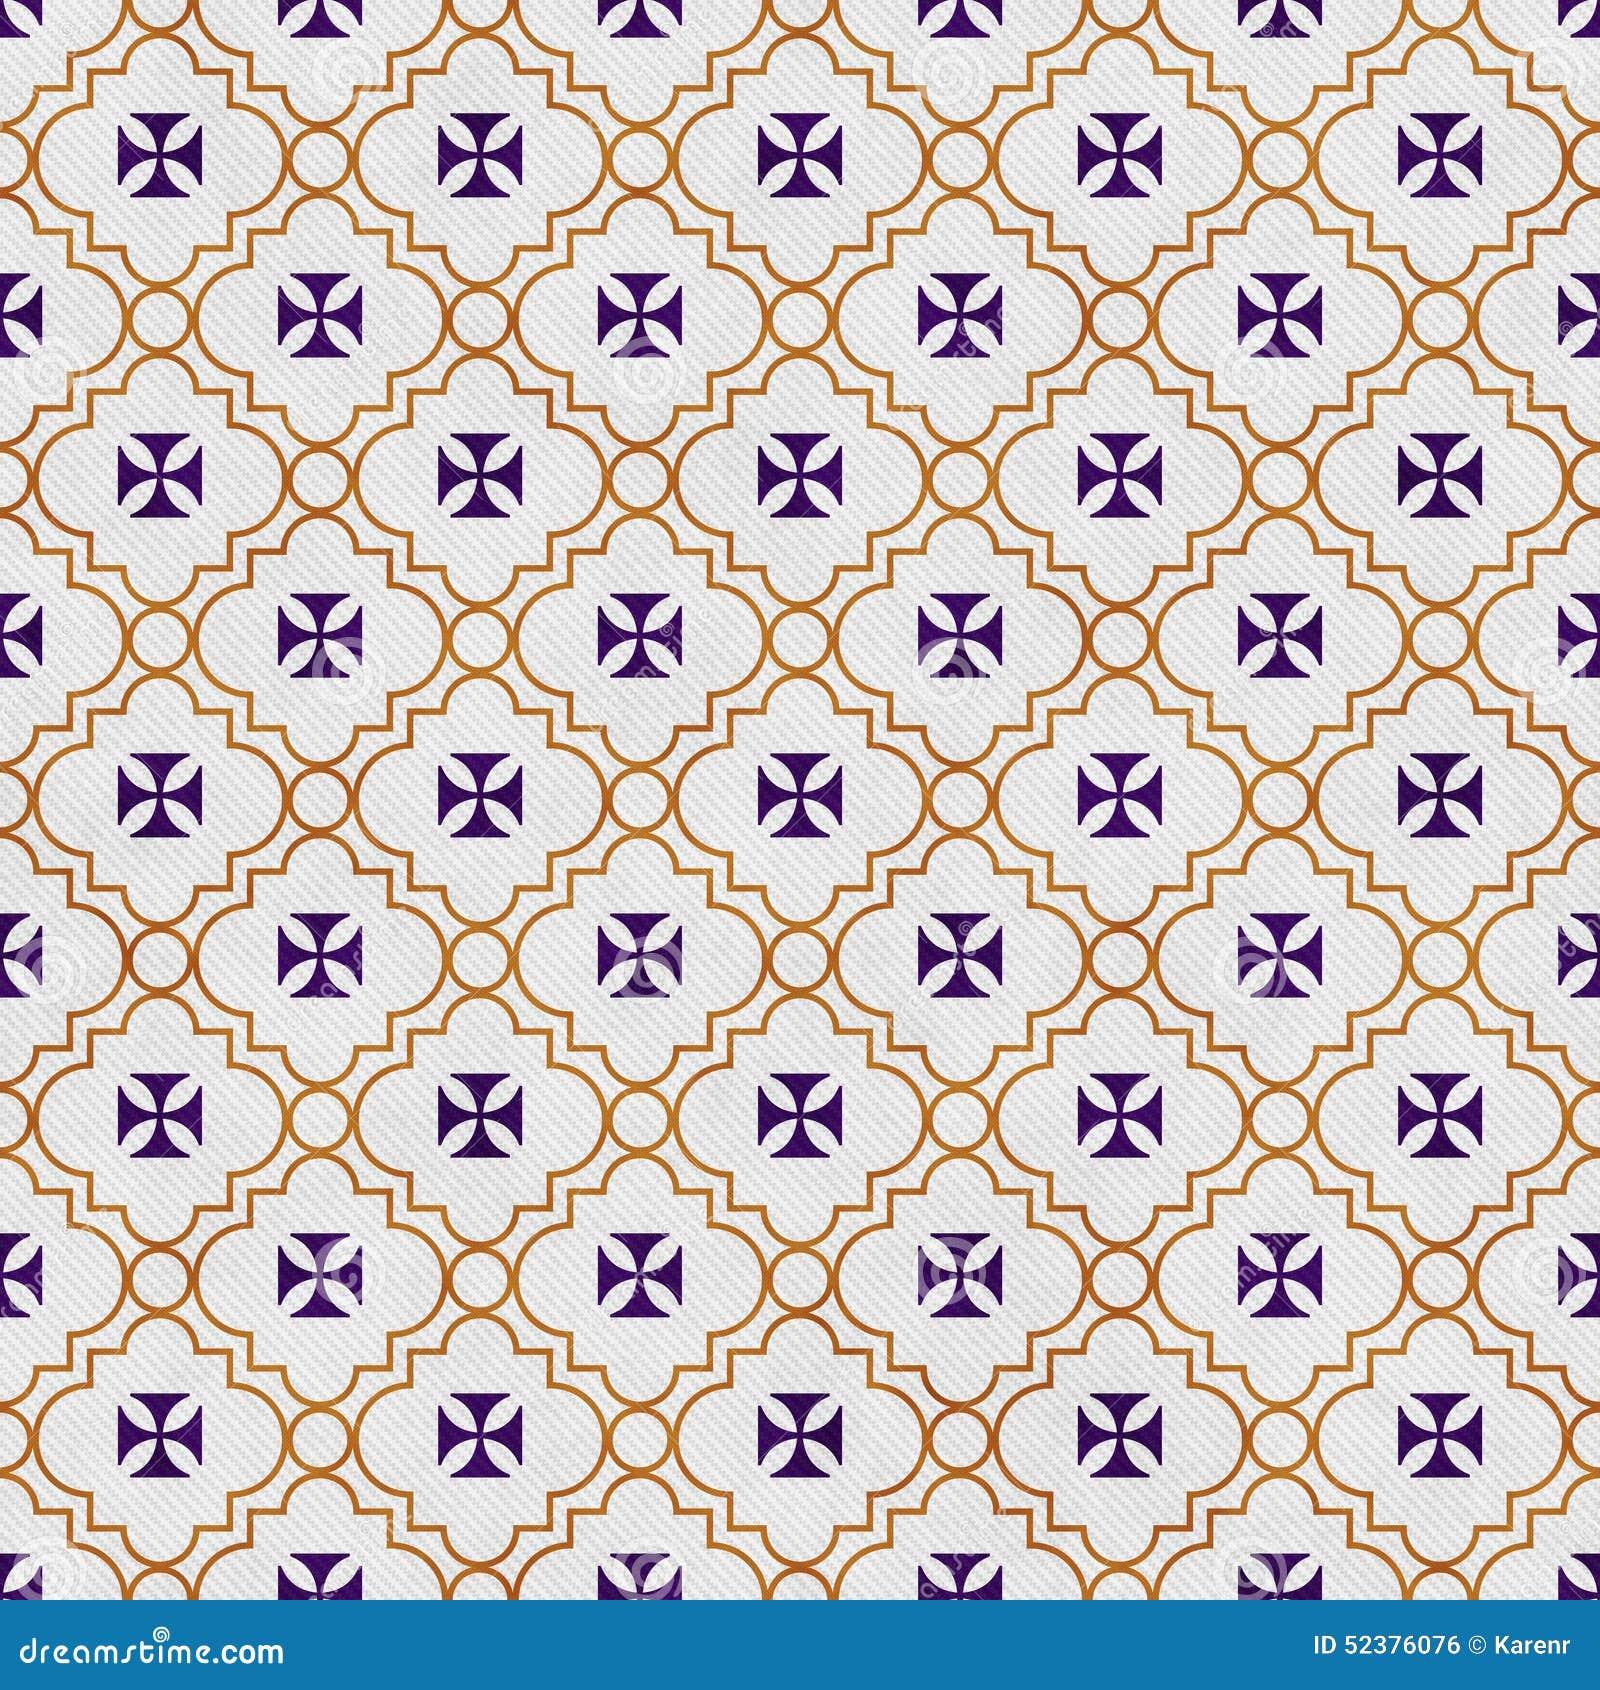 Purple and gold maltese cross symbol tile pattern repeat backgro purple and gold maltese cross symbol tile pattern repeat backgro biocorpaavc